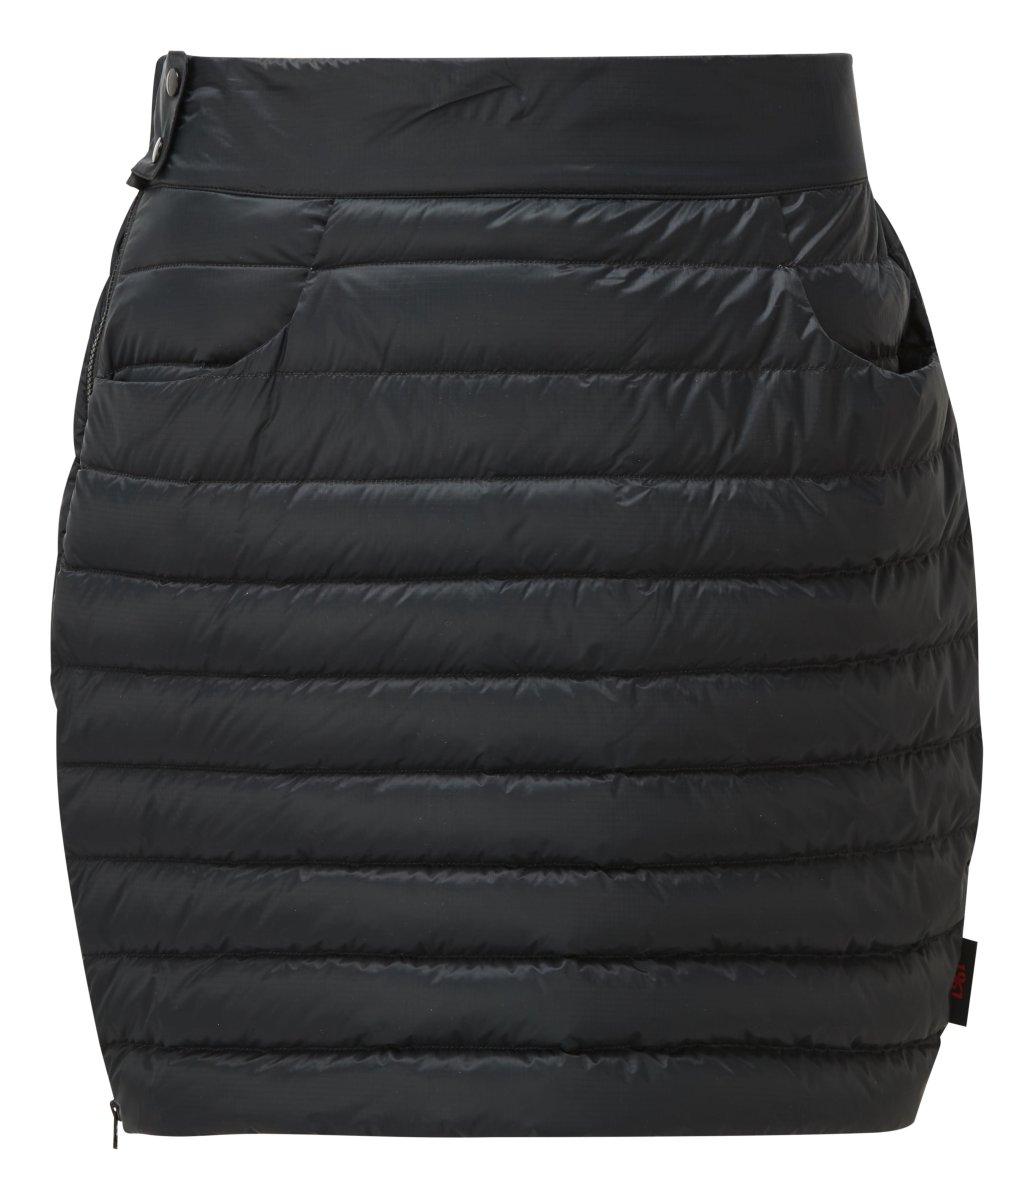 Mountain Equipment - Frostline Women's Skirt - Daunenrock für Frauen